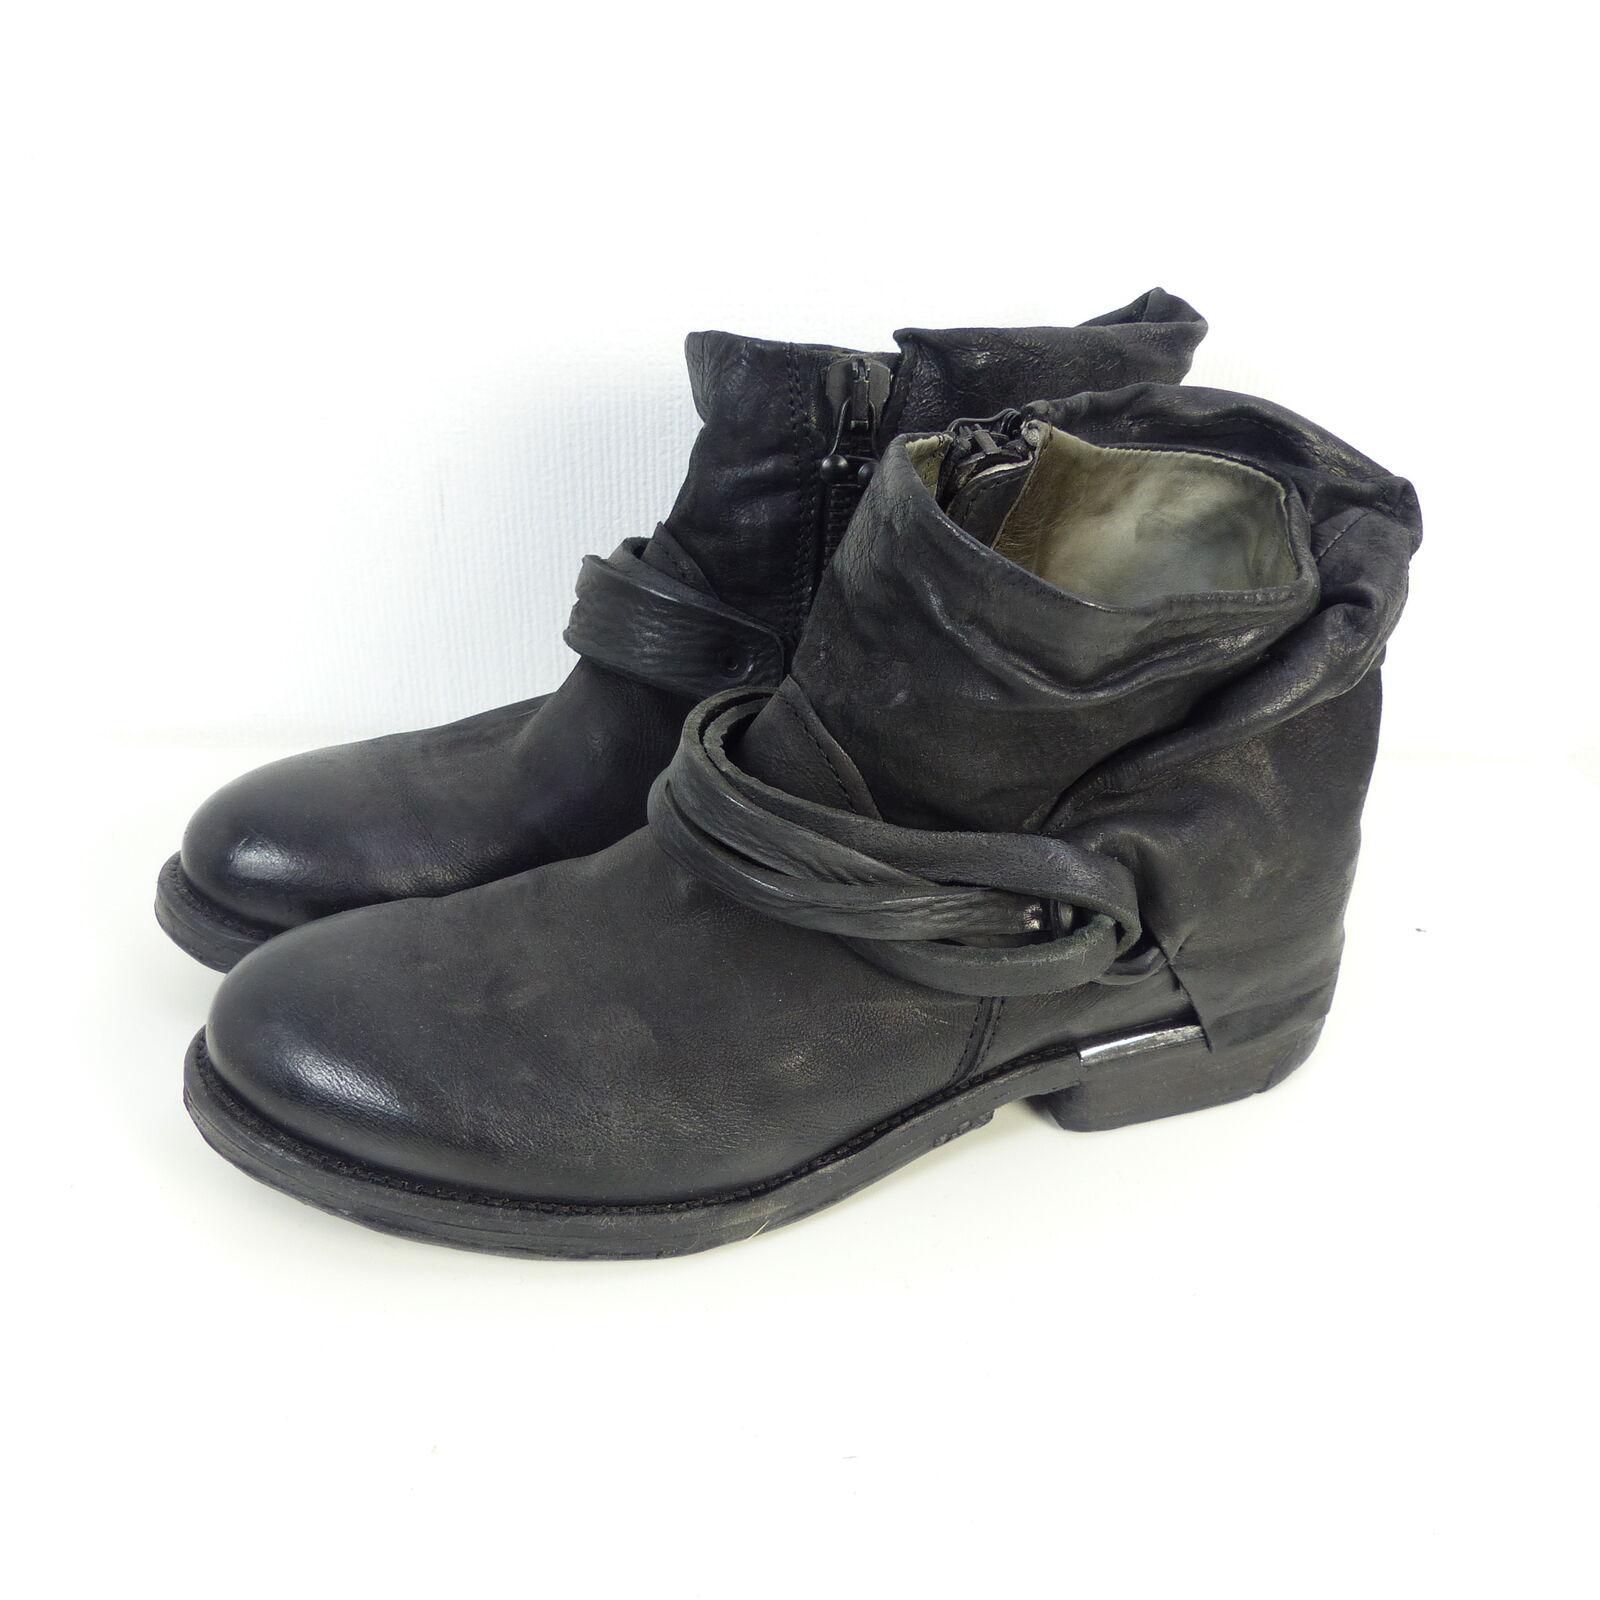 Grandes zapatos con descuento AS98 Airstep Stiefelette Boots Stiefel Leder Schwarz Gr. EUR 40 (H27)